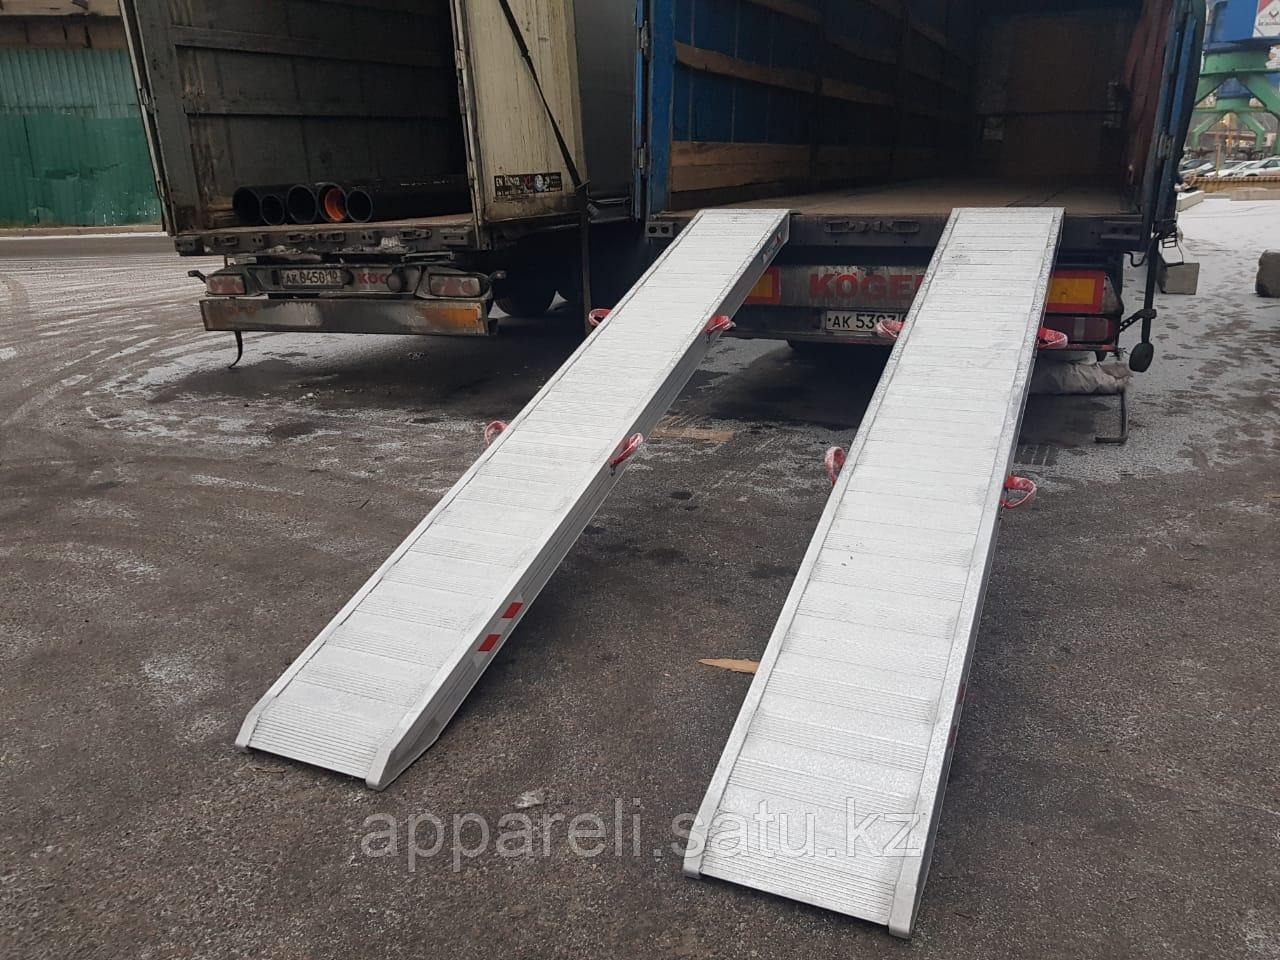 Аппарели, грузоподъёмность 7,5 тонн без бортов